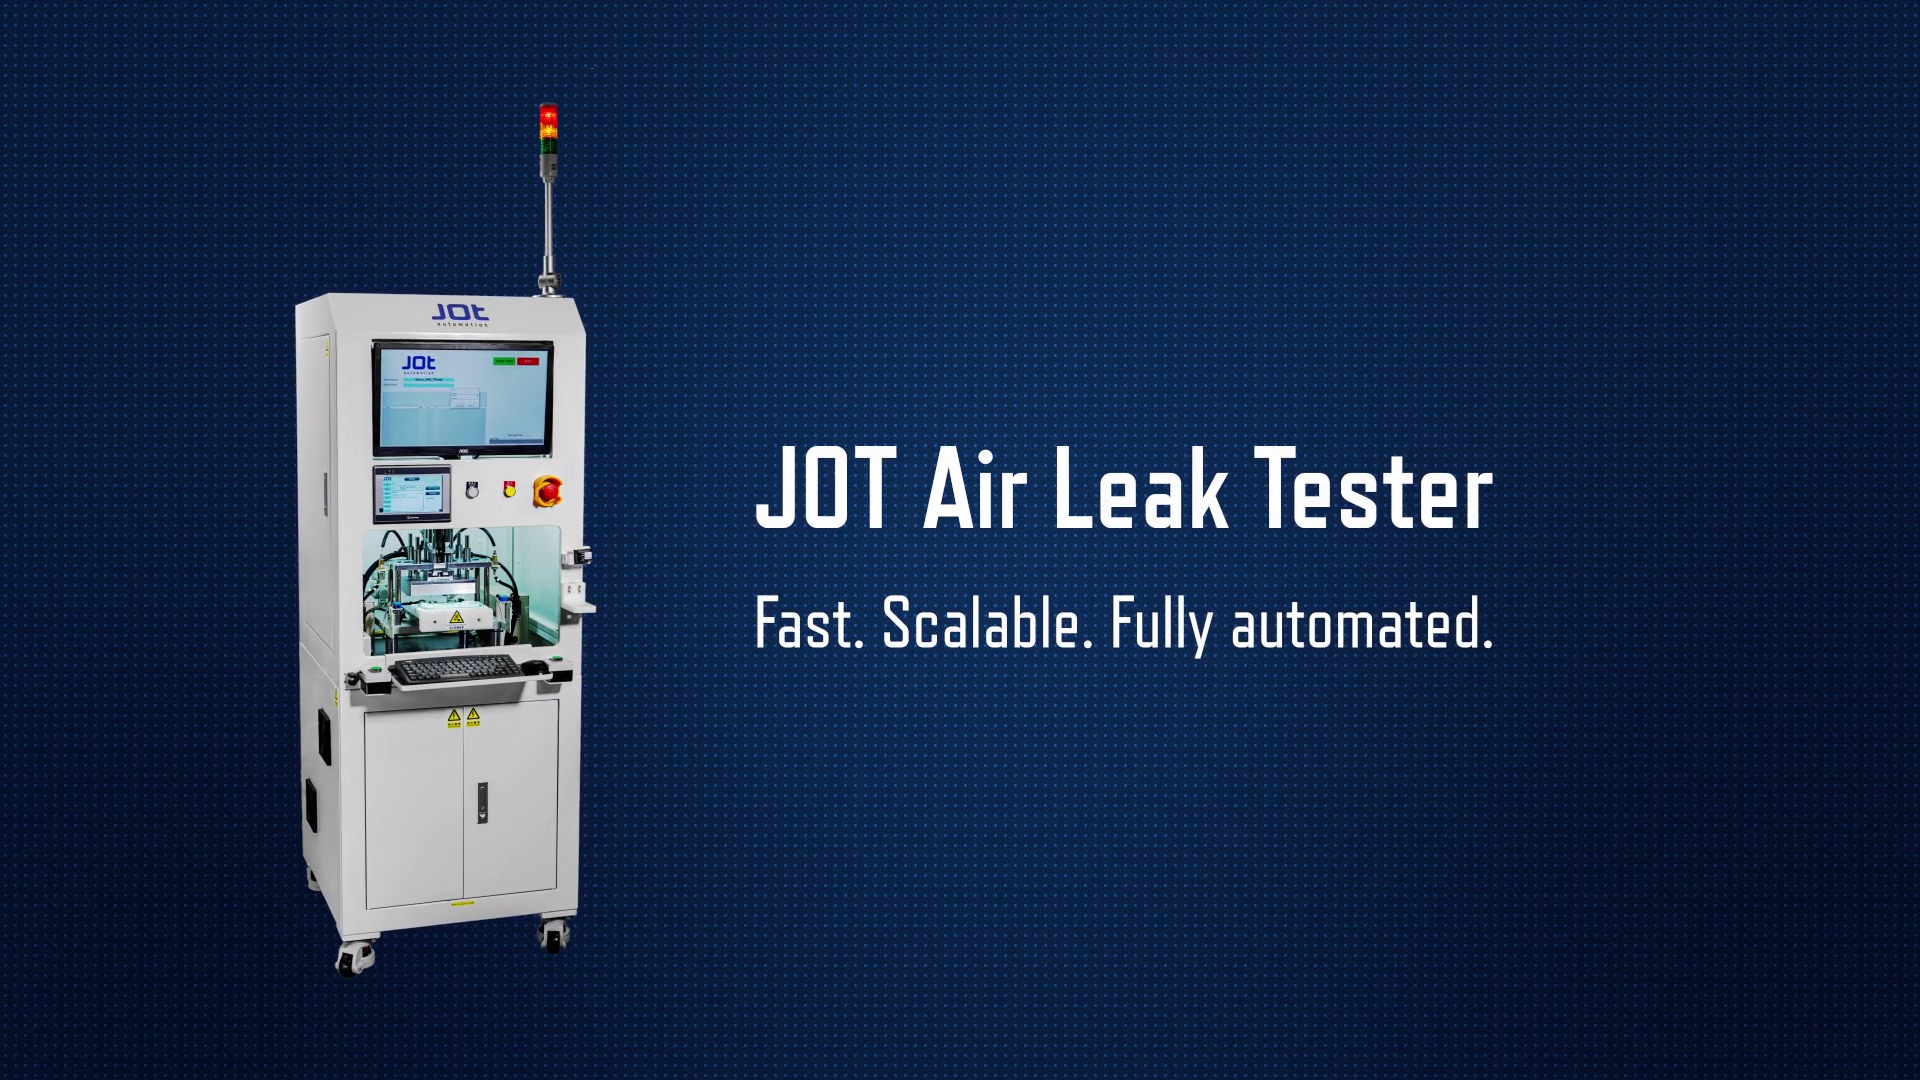 JOT Air leak tester 1080p